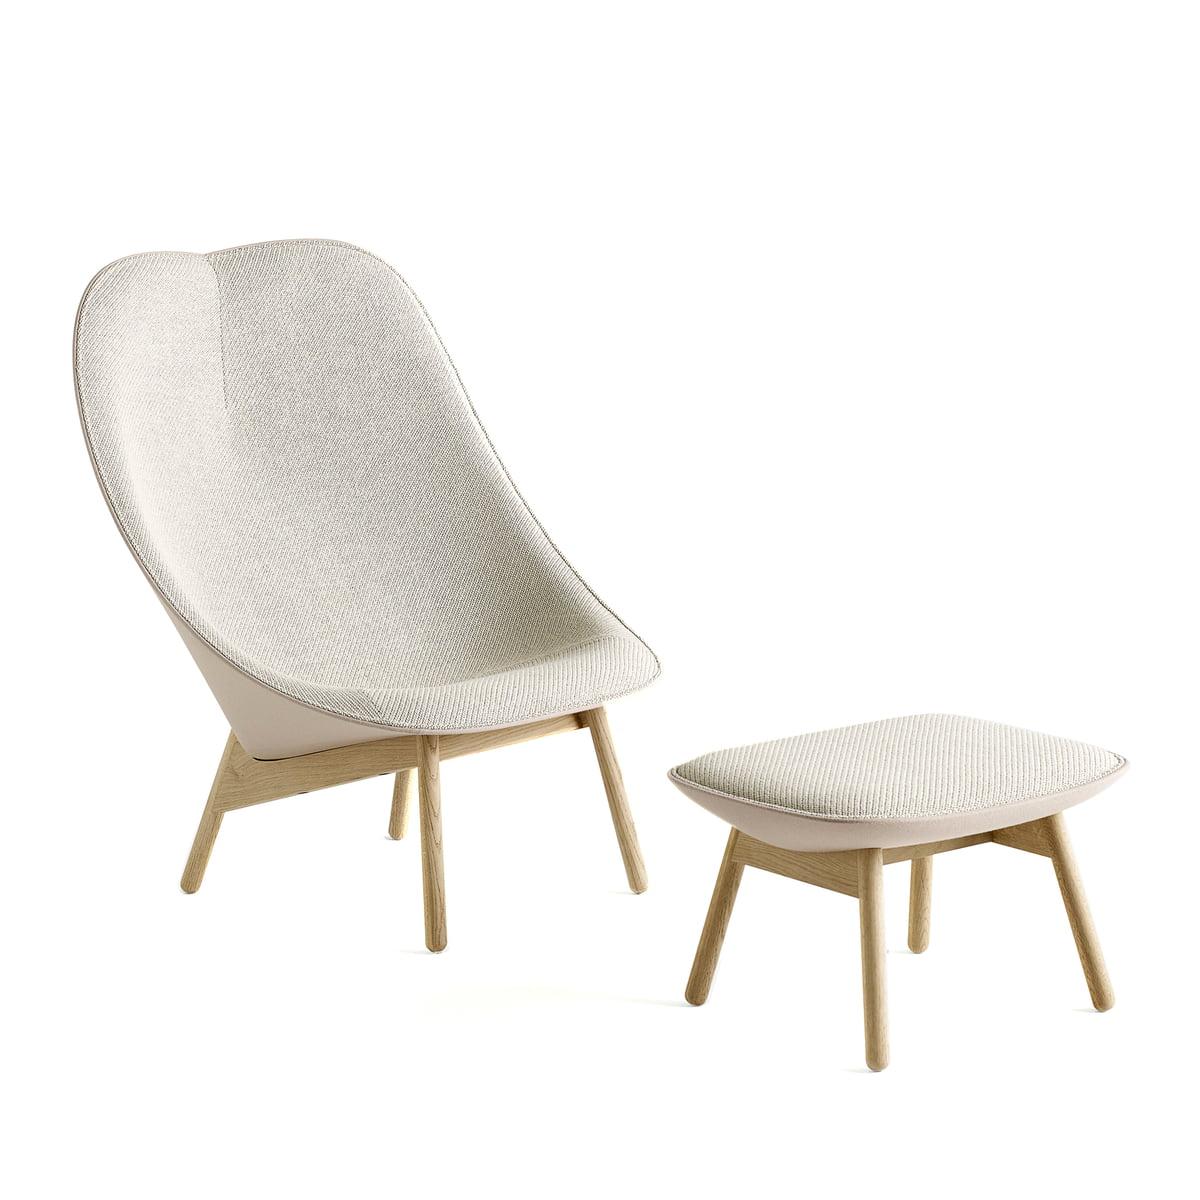 uchiwa sessel von hay connox shop. Black Bedroom Furniture Sets. Home Design Ideas